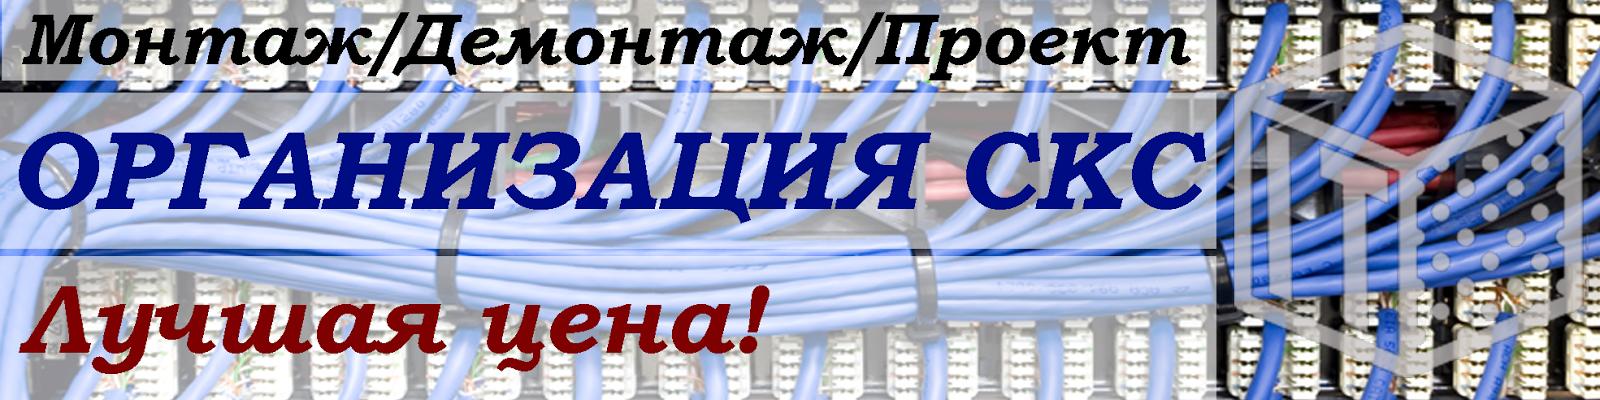 Организация СКС. Монтаж / Демотнаж / Проект